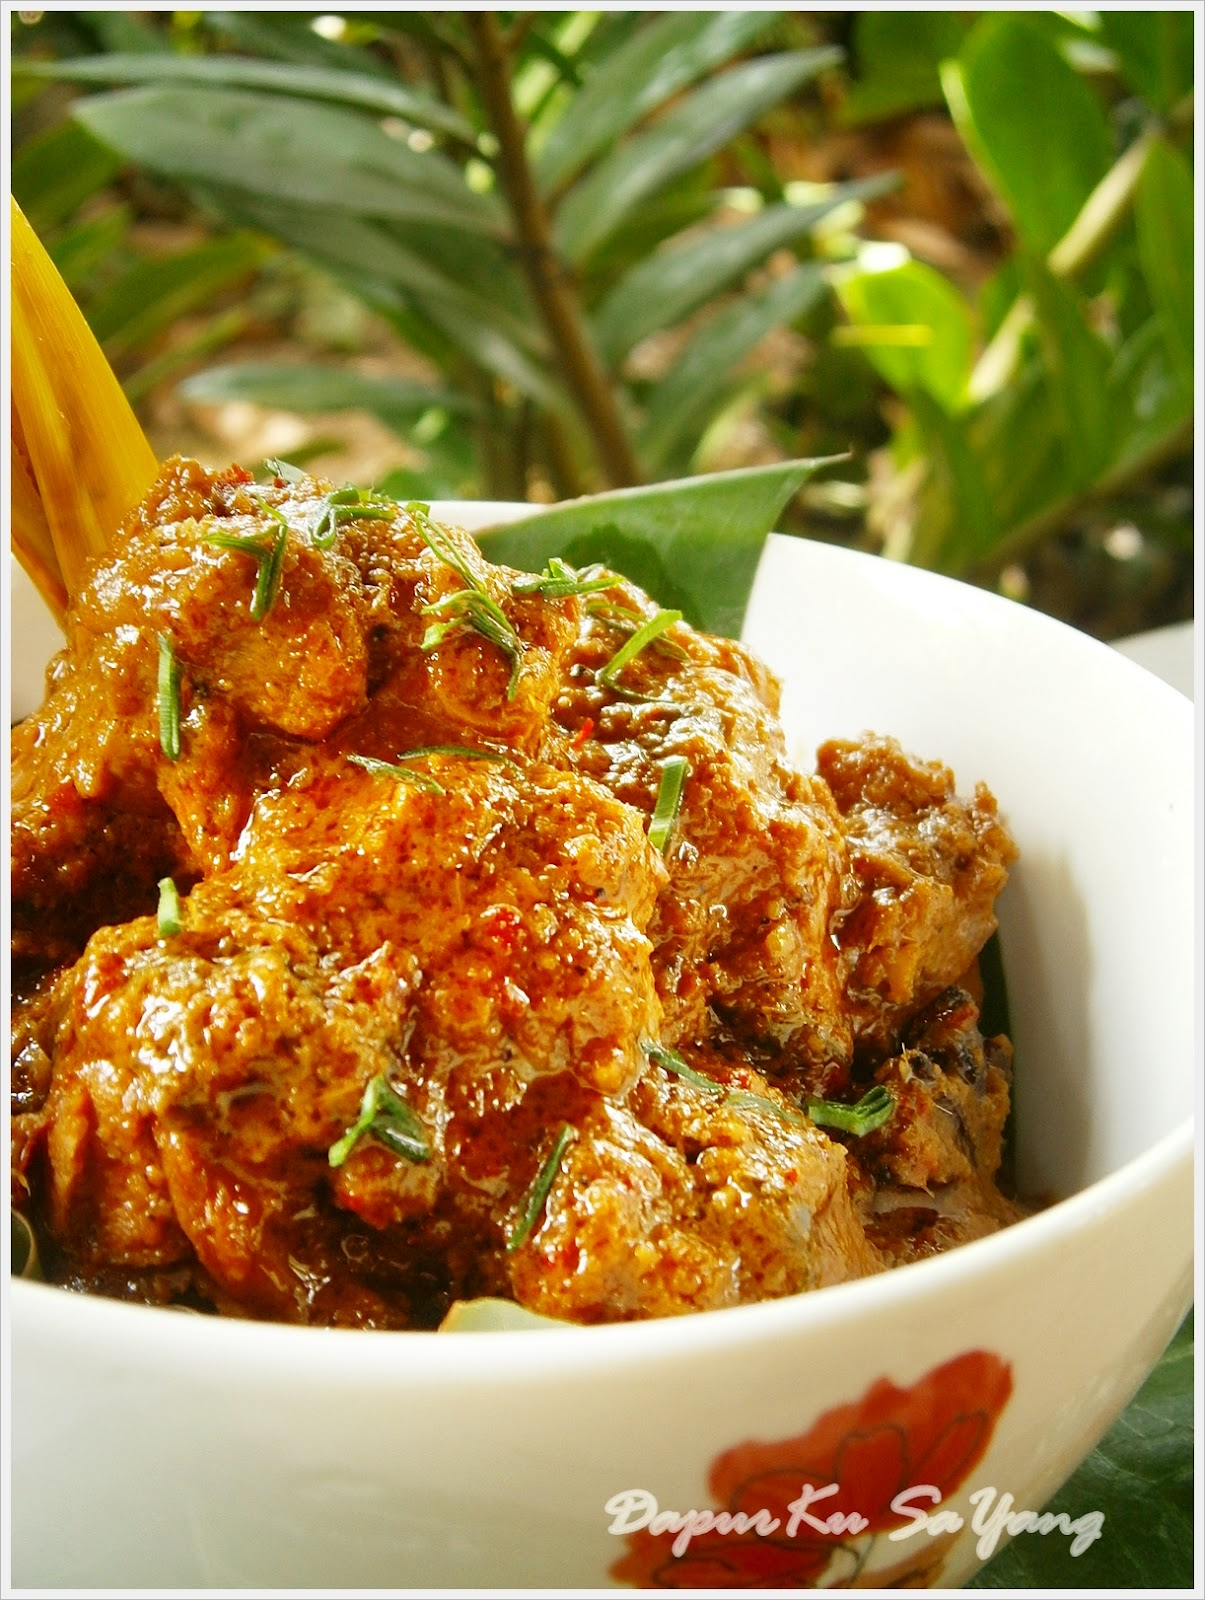 dapurku sayang rendang ayam rindunya nak blogging semula Resepi Rendang Ayam Negeri Melaka Enak dan Mudah